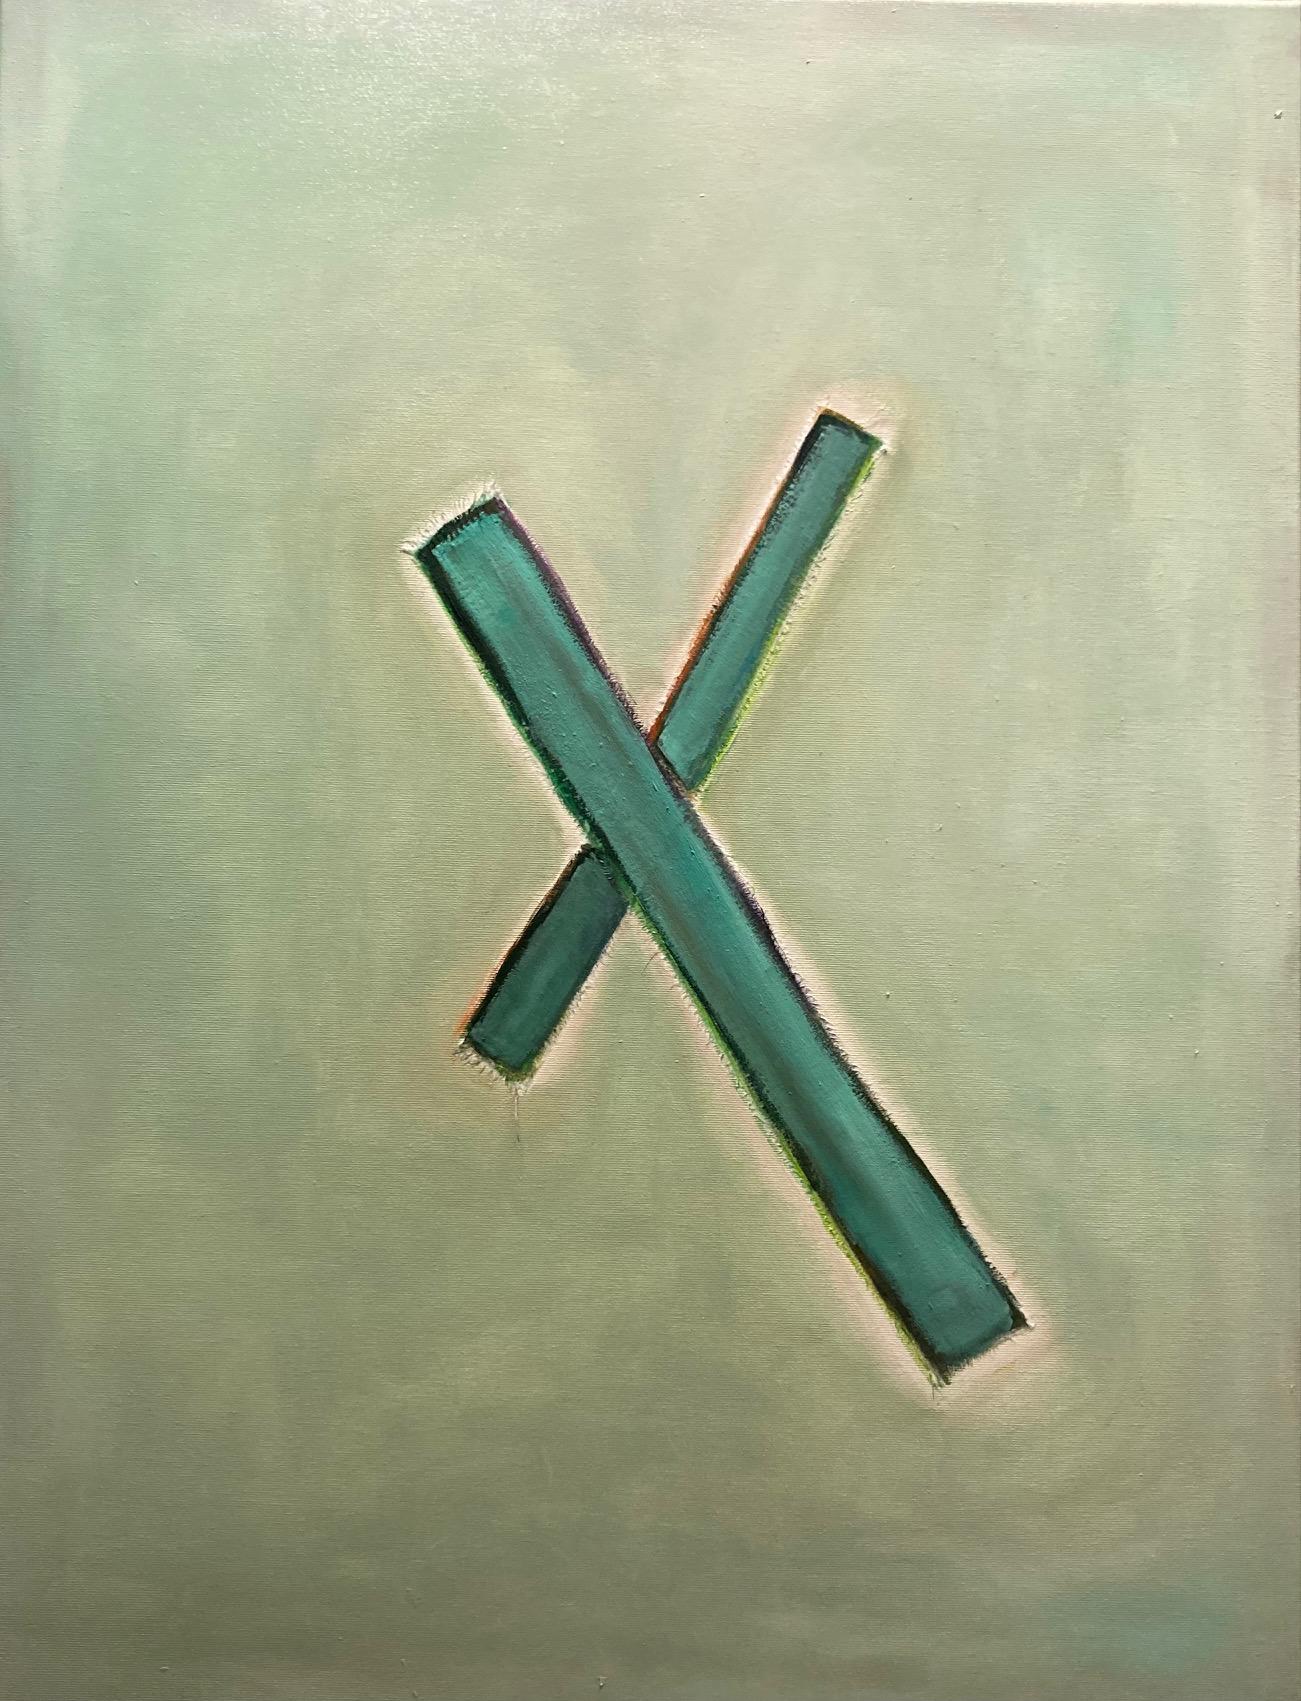 Silent Sign (4), Öl auf Leinwand, 80 x 60 cm, 2020